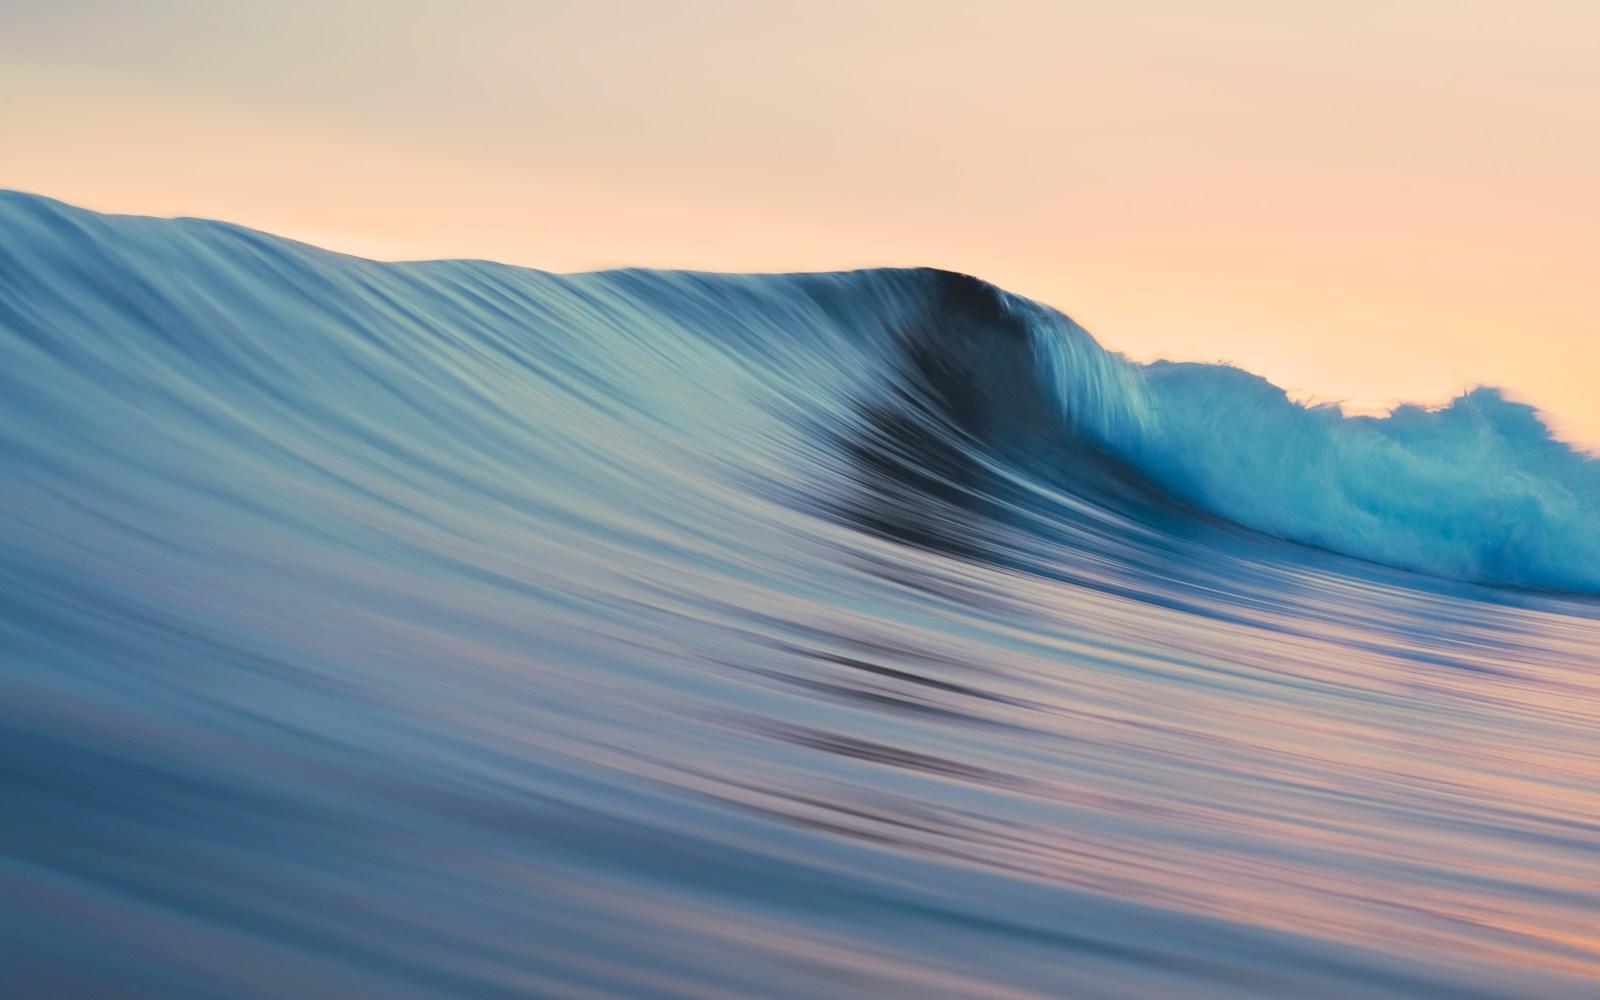 Gallery: Eight beautiful new OS X Mavericks wallpapers